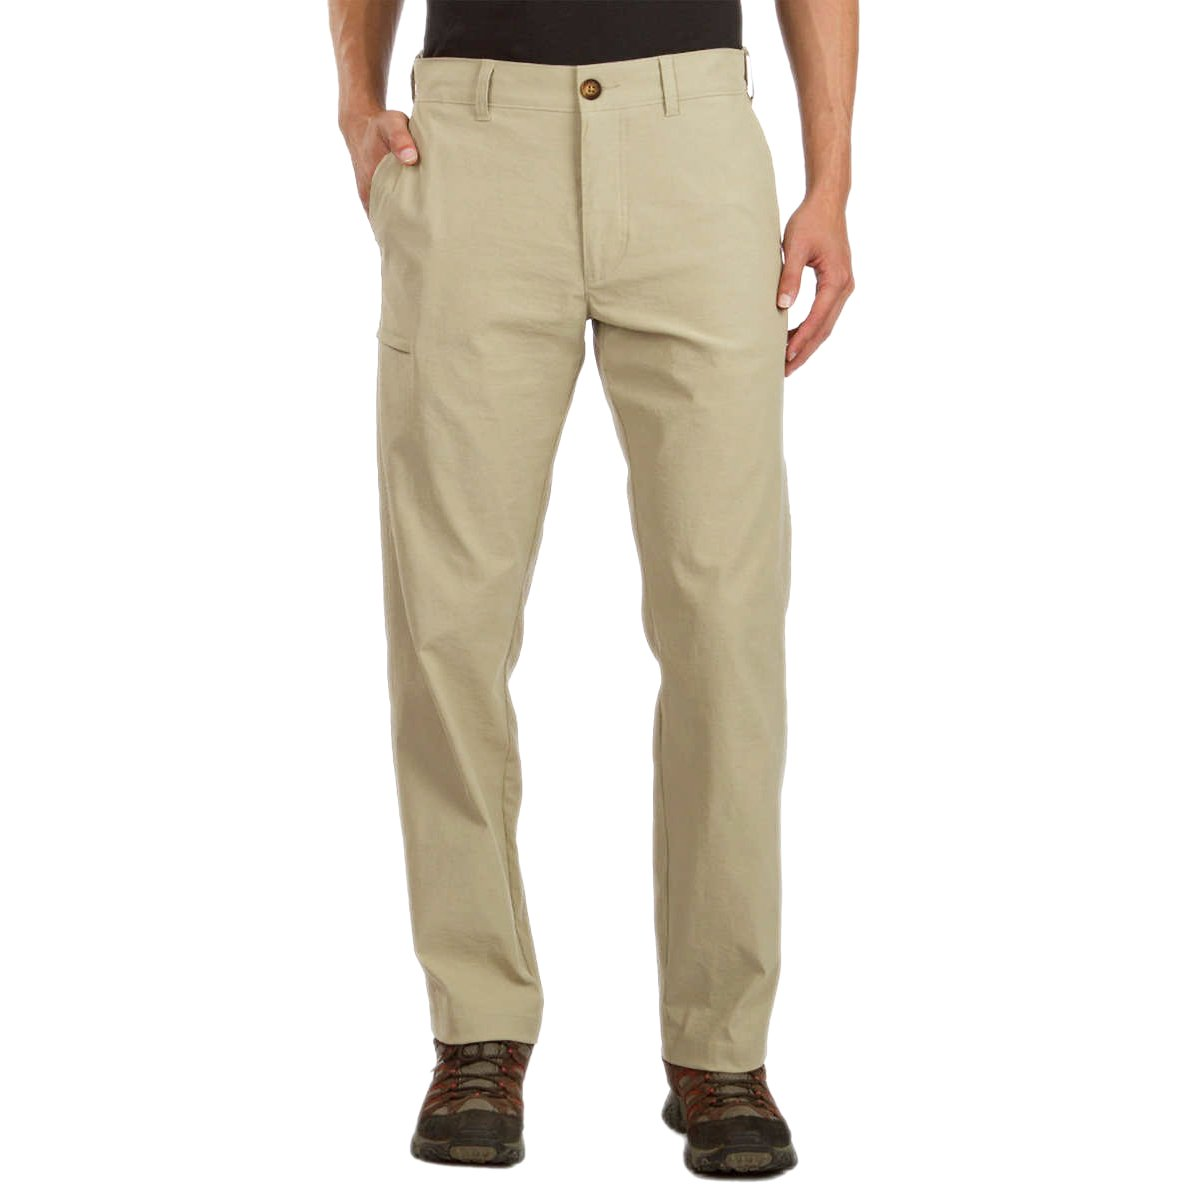 UNIONBAY UB Tech Classic Fit Expandable Comfort Waist Chino Pant for Men (36W x 32L, Desert)